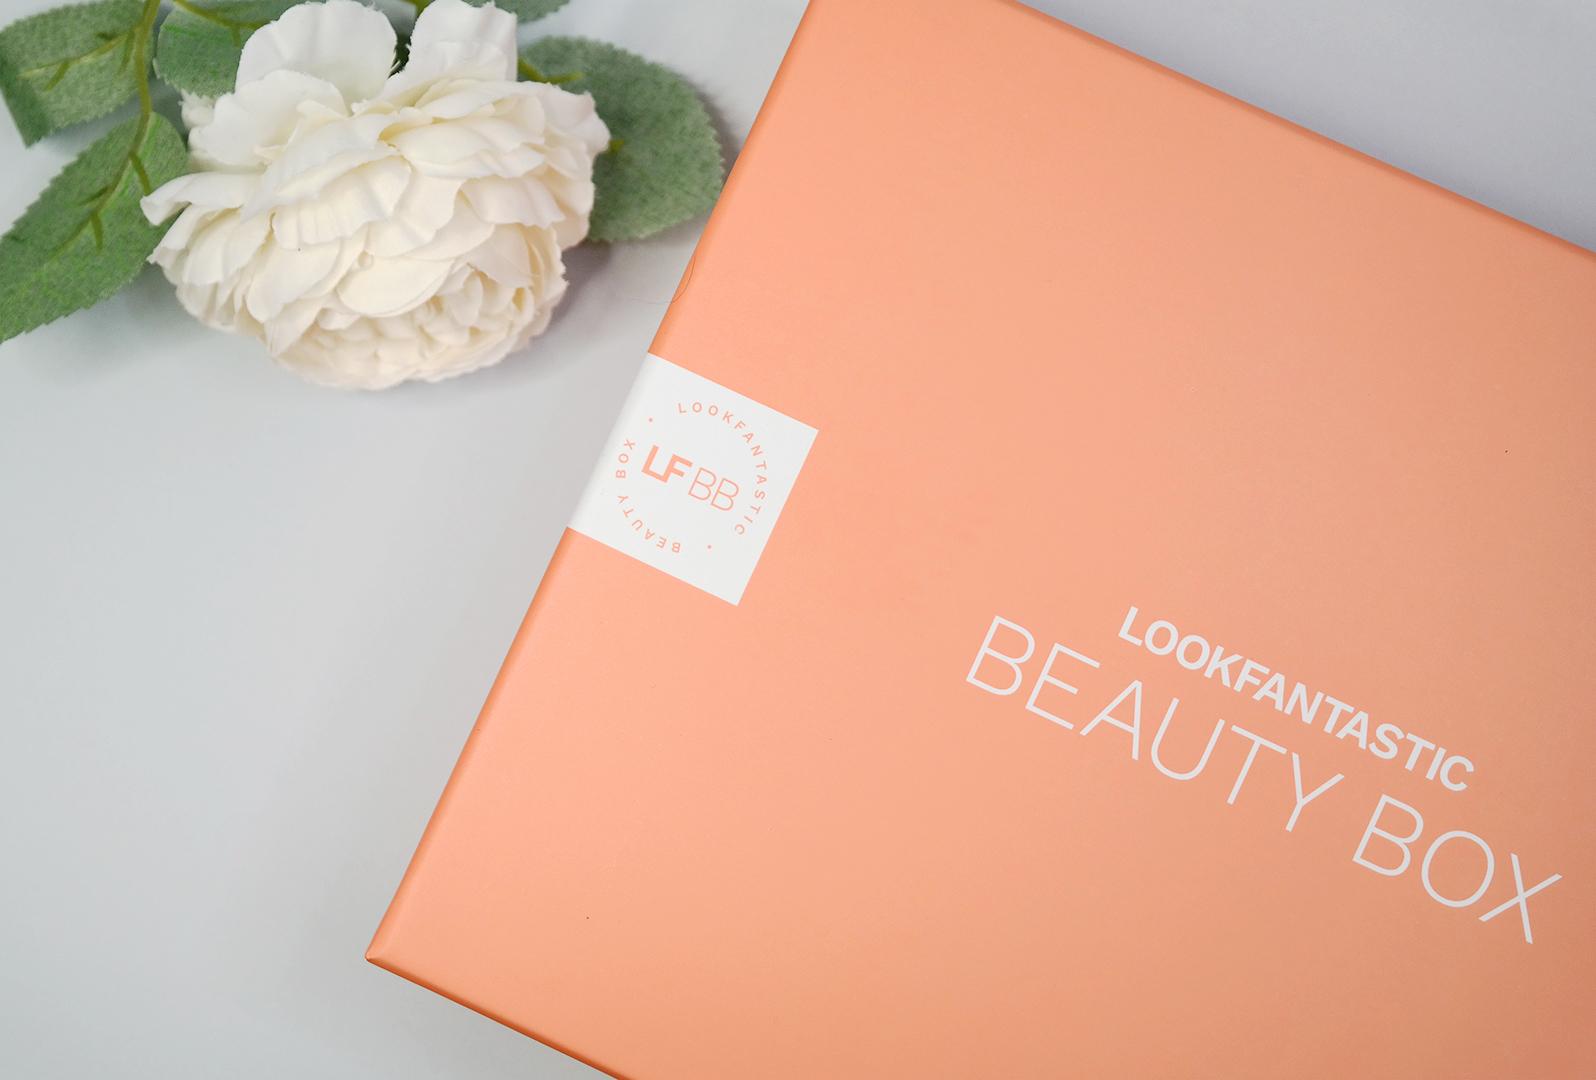 Lookfantastic Beauty Box helmikuu